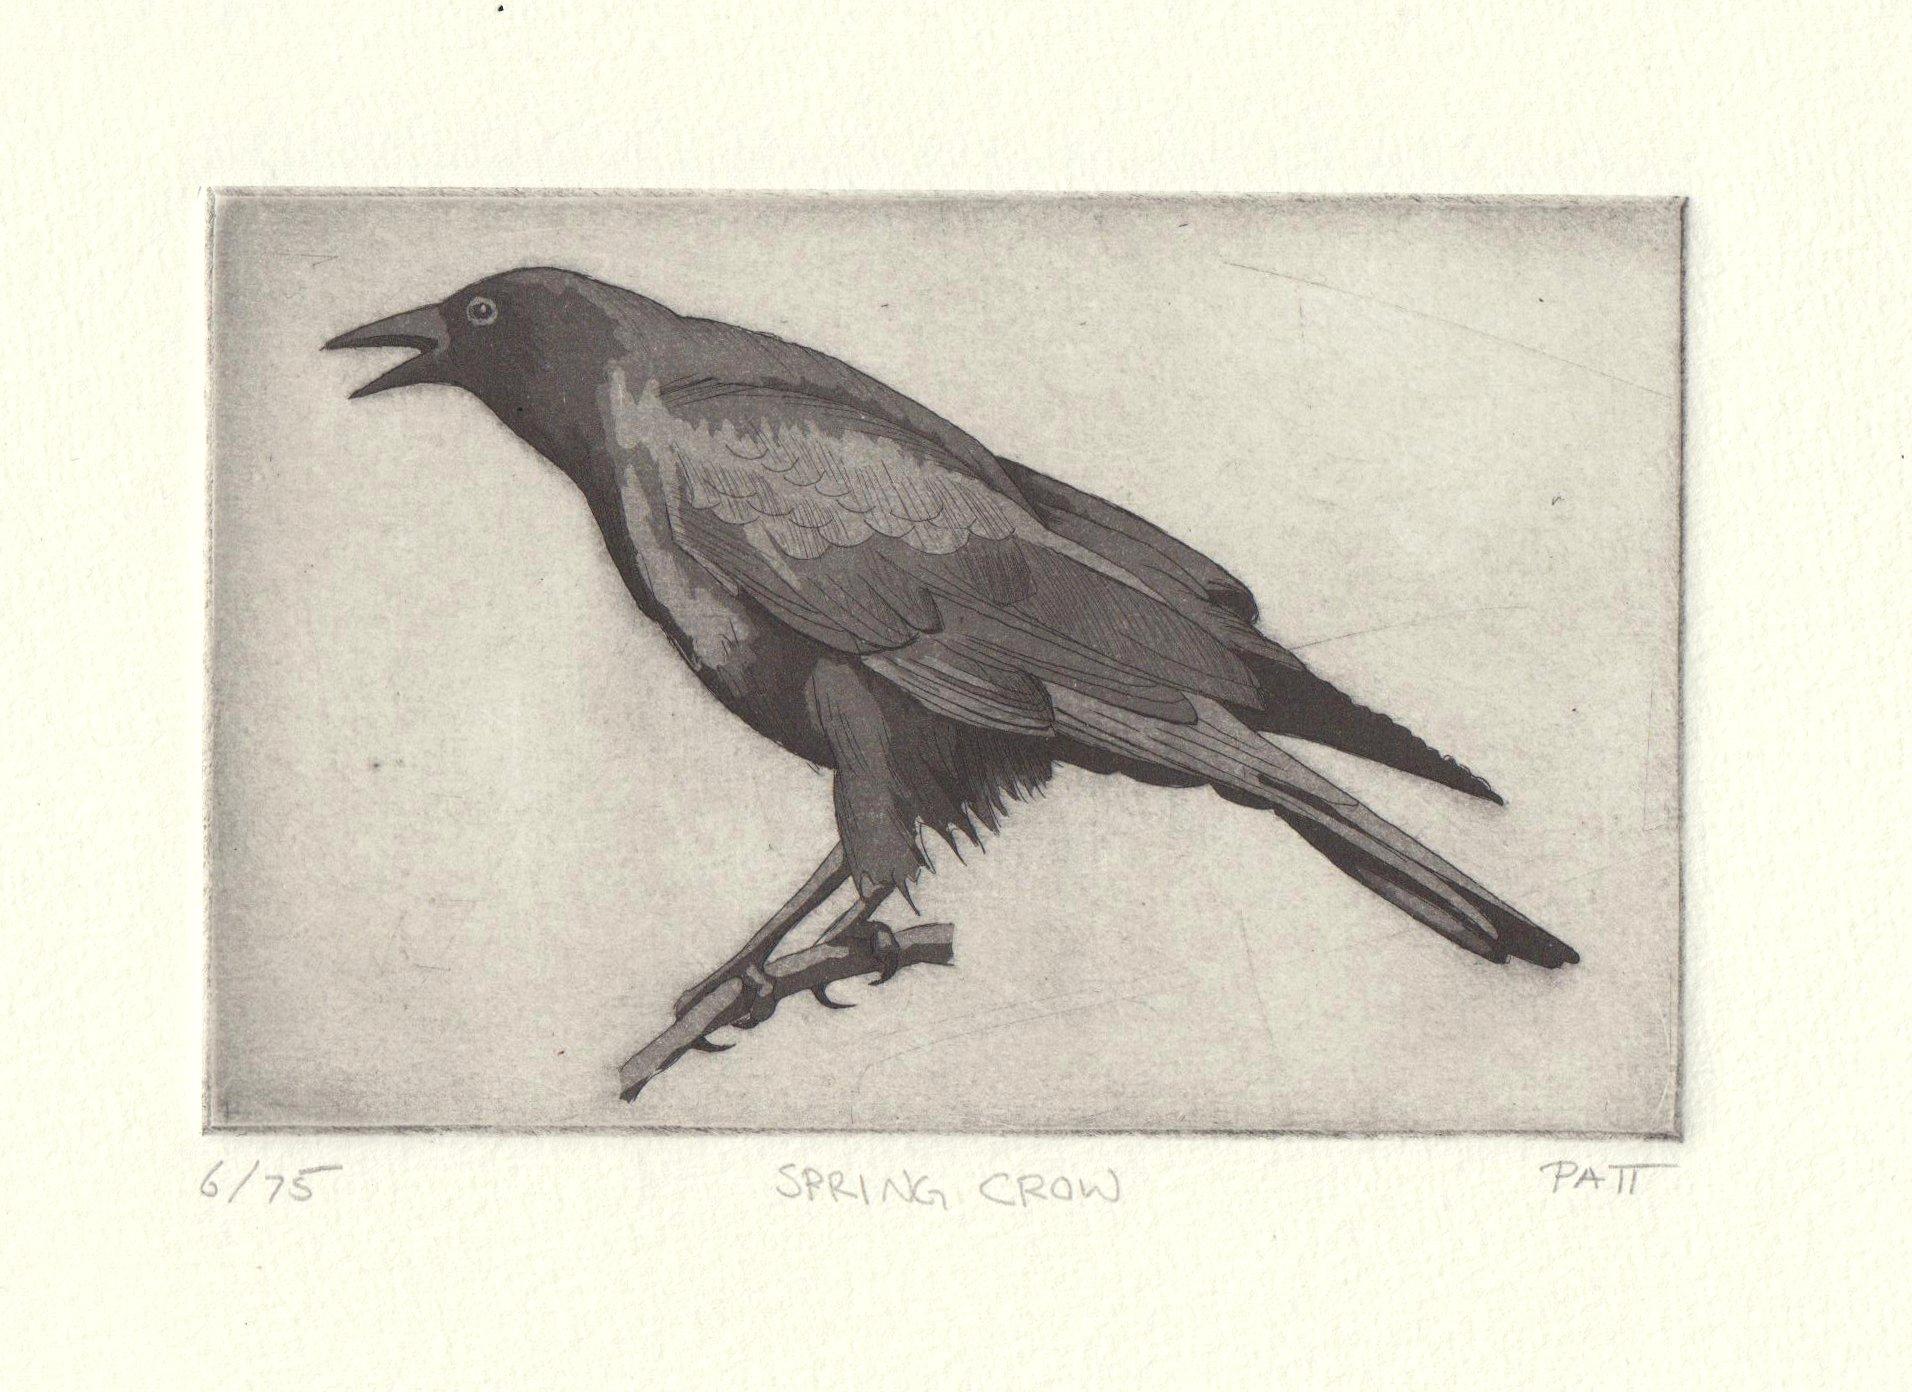 Summer Crow - hand tinted on hannemuelle - 6of75.jpg.jpeg